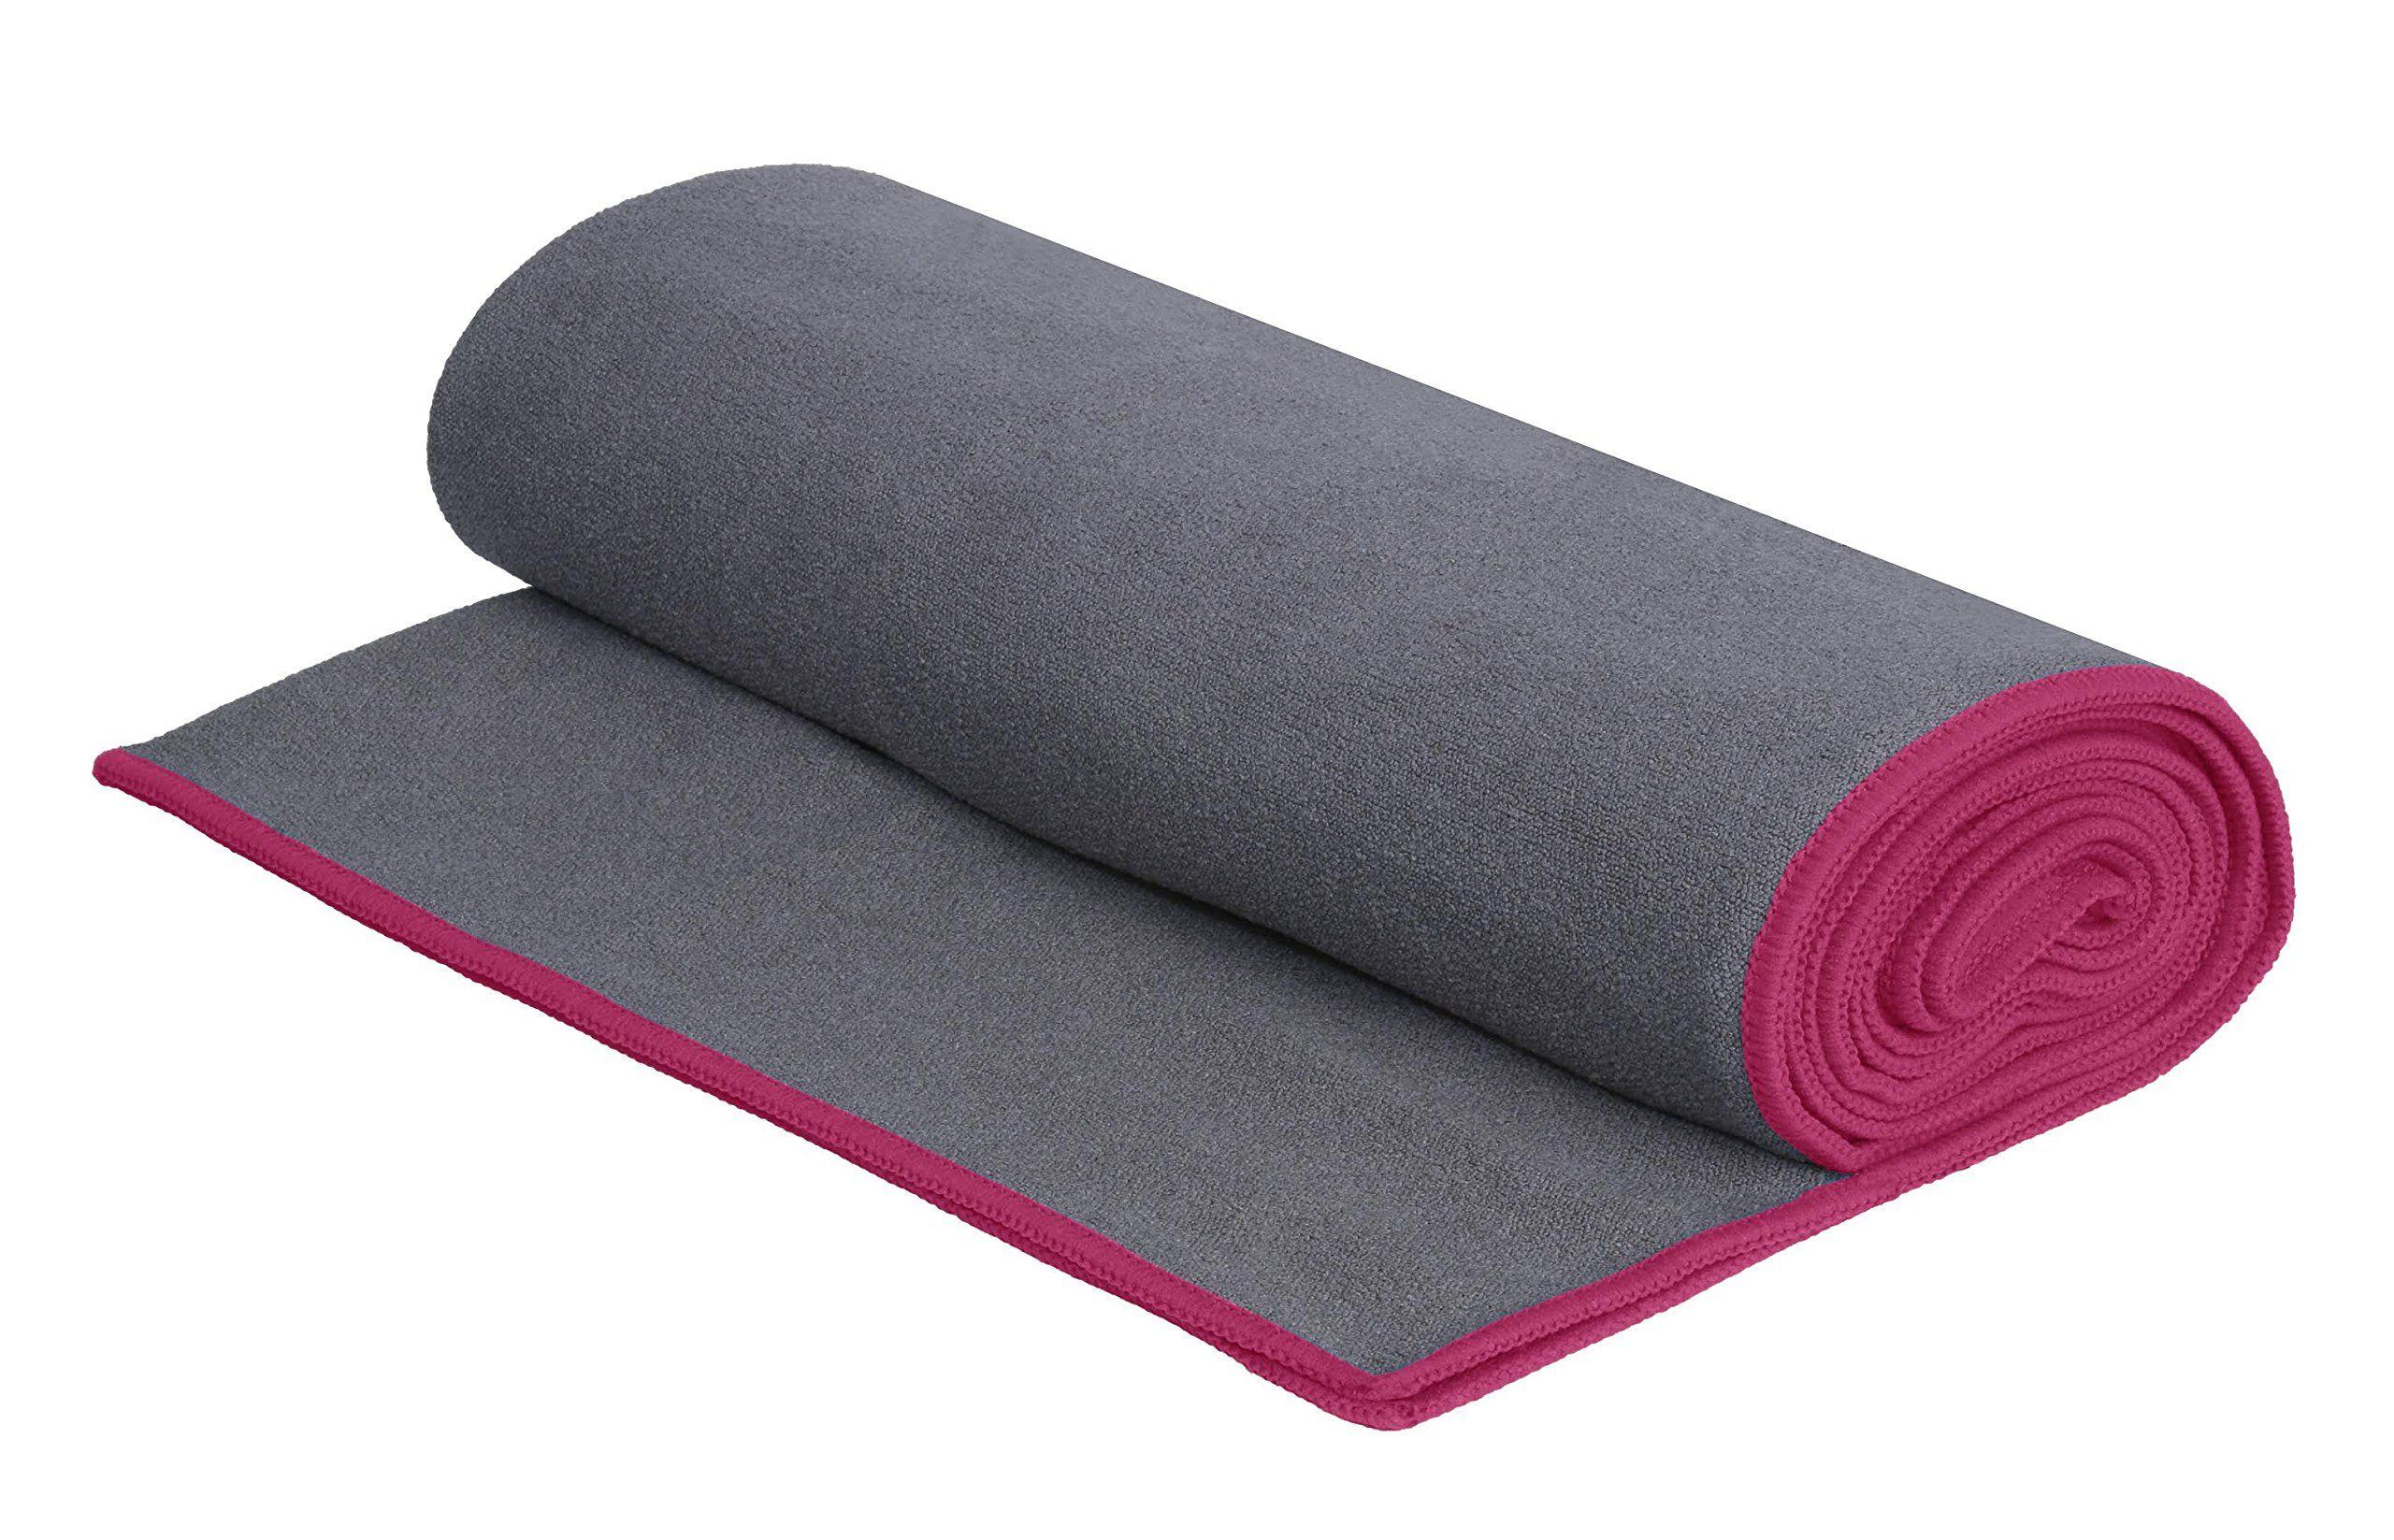 pilates hot news mats mar class at friendly coral classes yoga family sunday house miami mat noon bikram